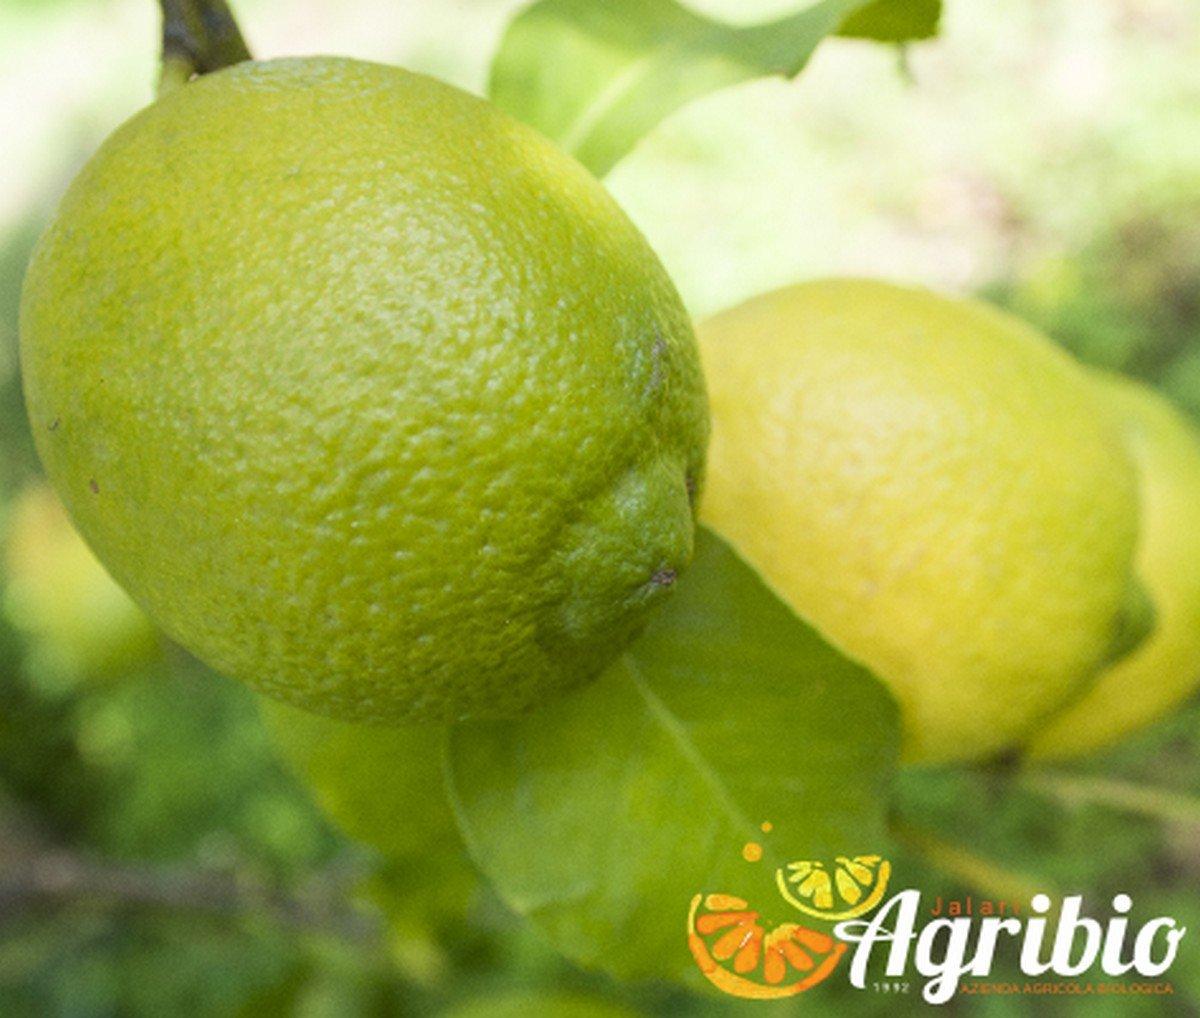 Azienda agricola biologica jalari - Agrumi biologici siciliani - limone femminello siracusano